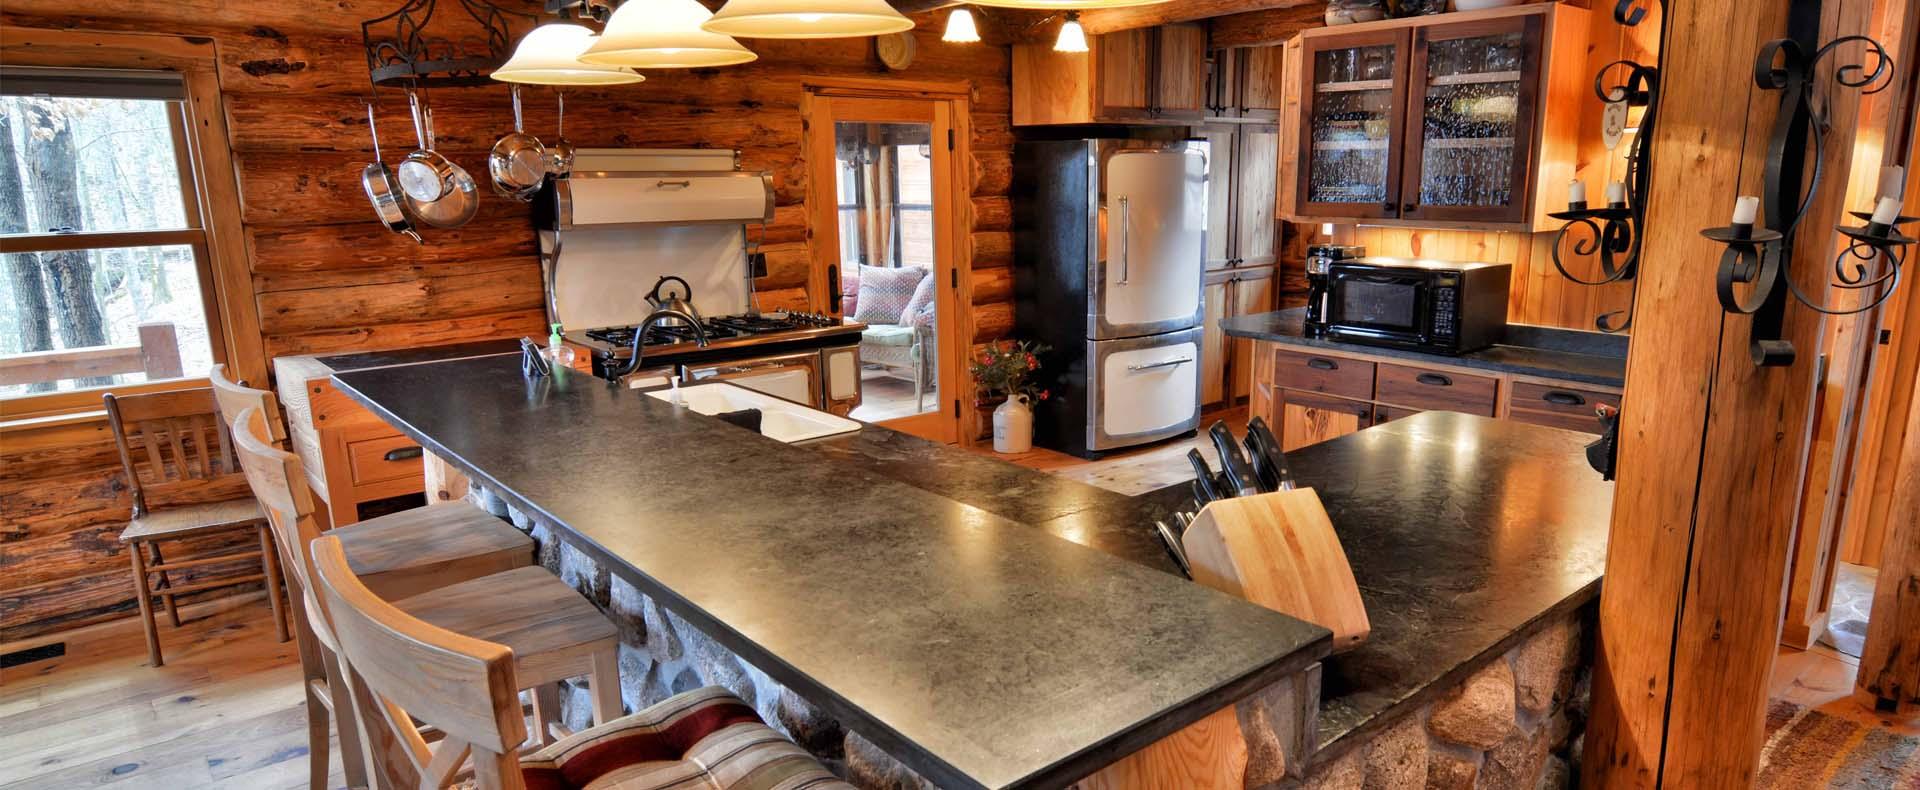 cumberland-log-home-for-sale